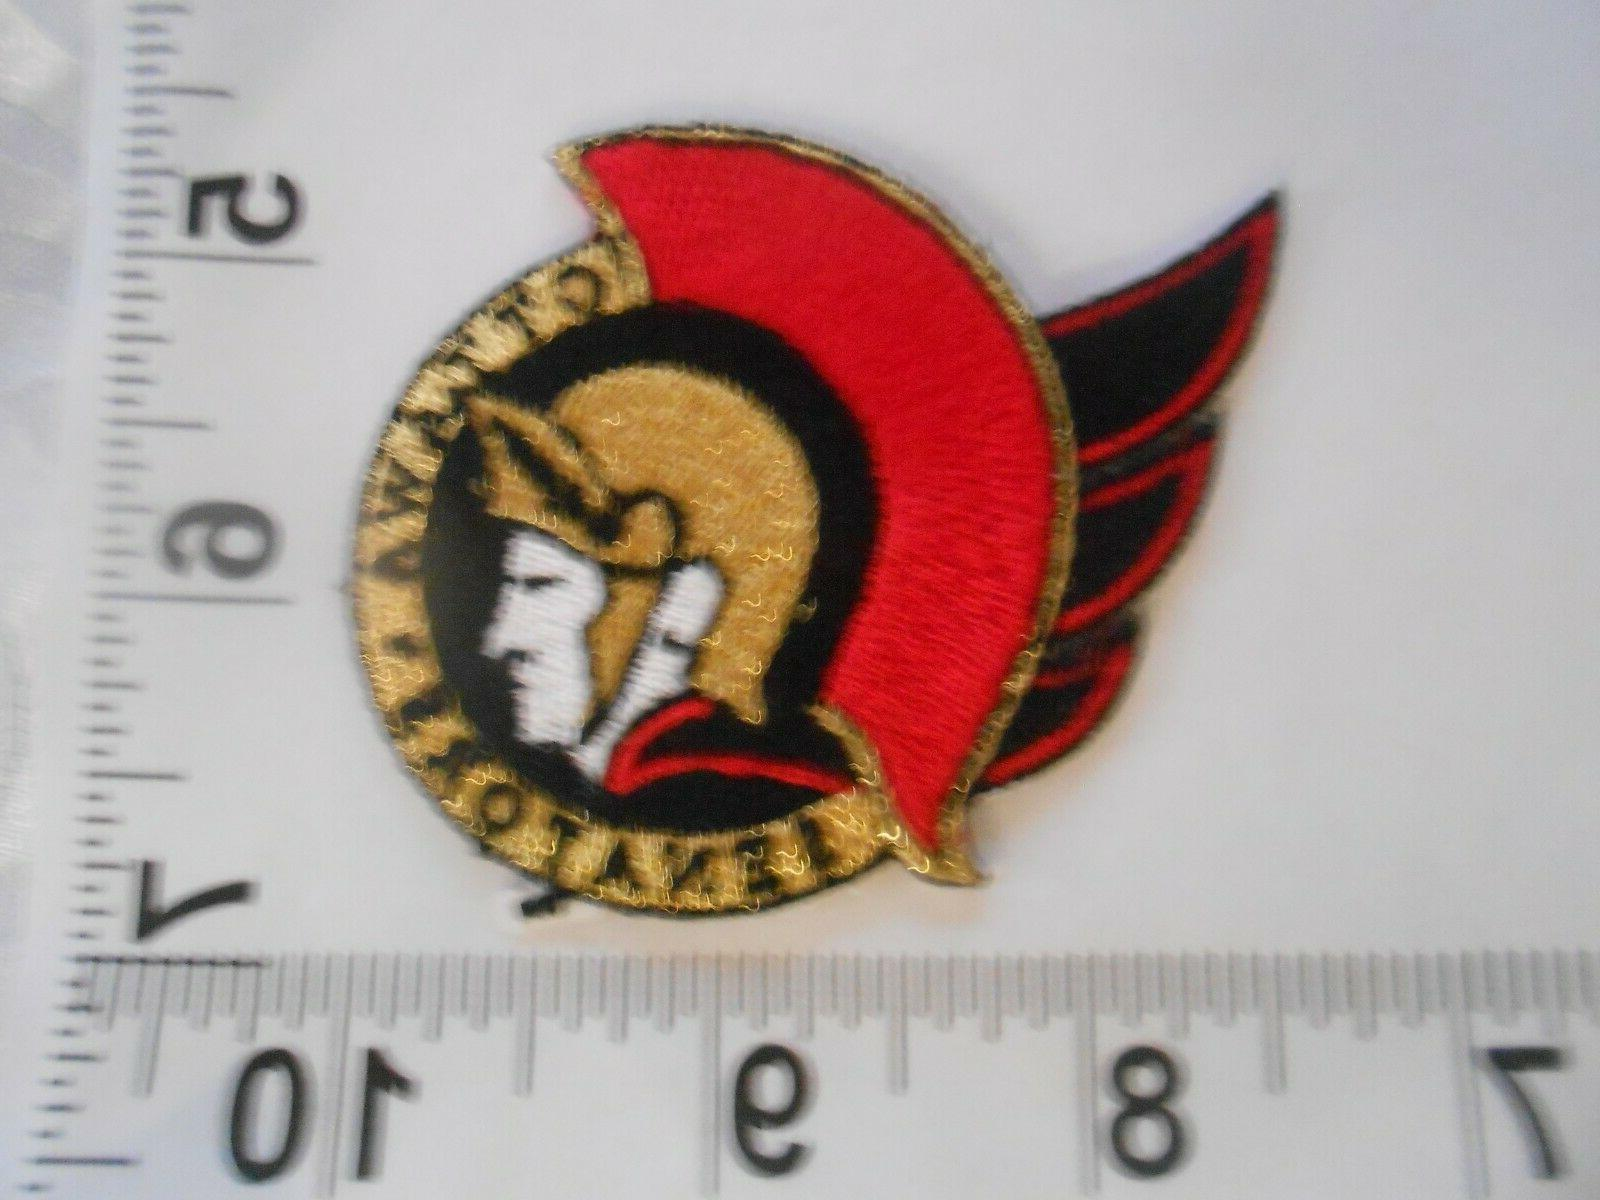 ottawa senators logo nhl hockey hat shirt